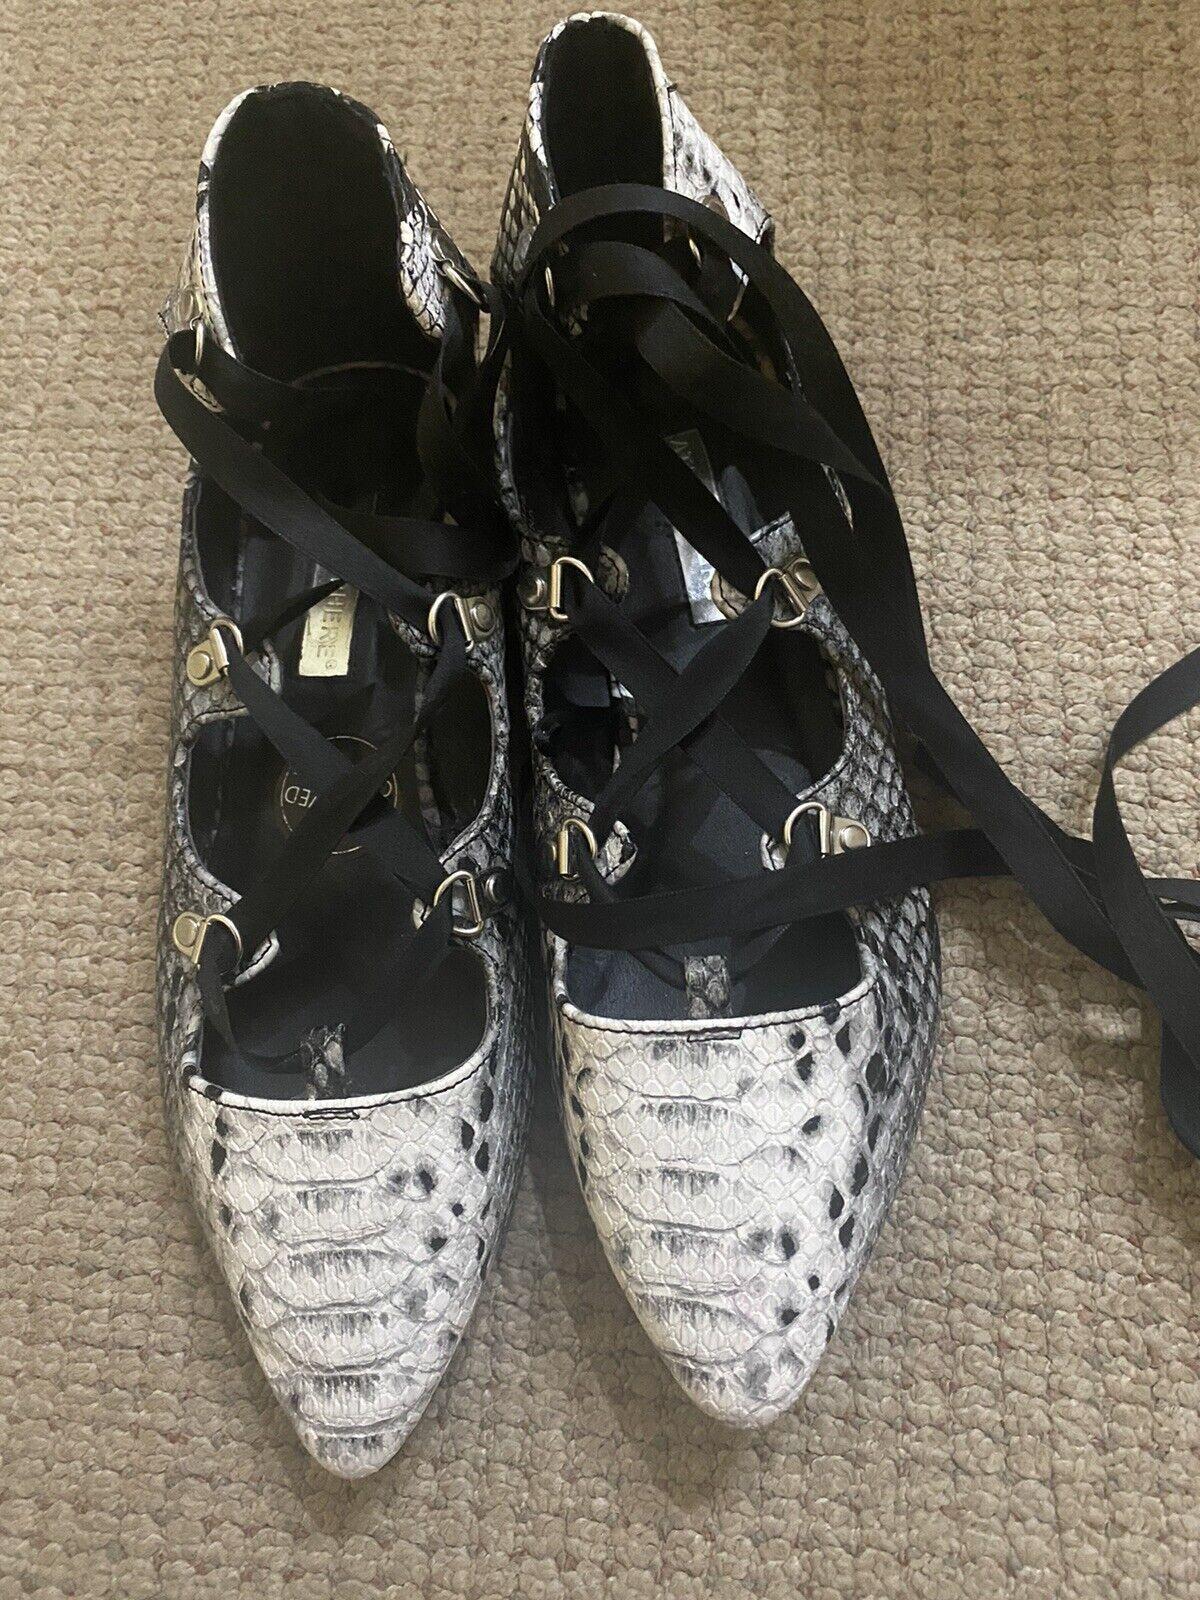 Atmosphere Lovely Snake Pattern White/Grey/Black Lace-up Shoes - UK 5